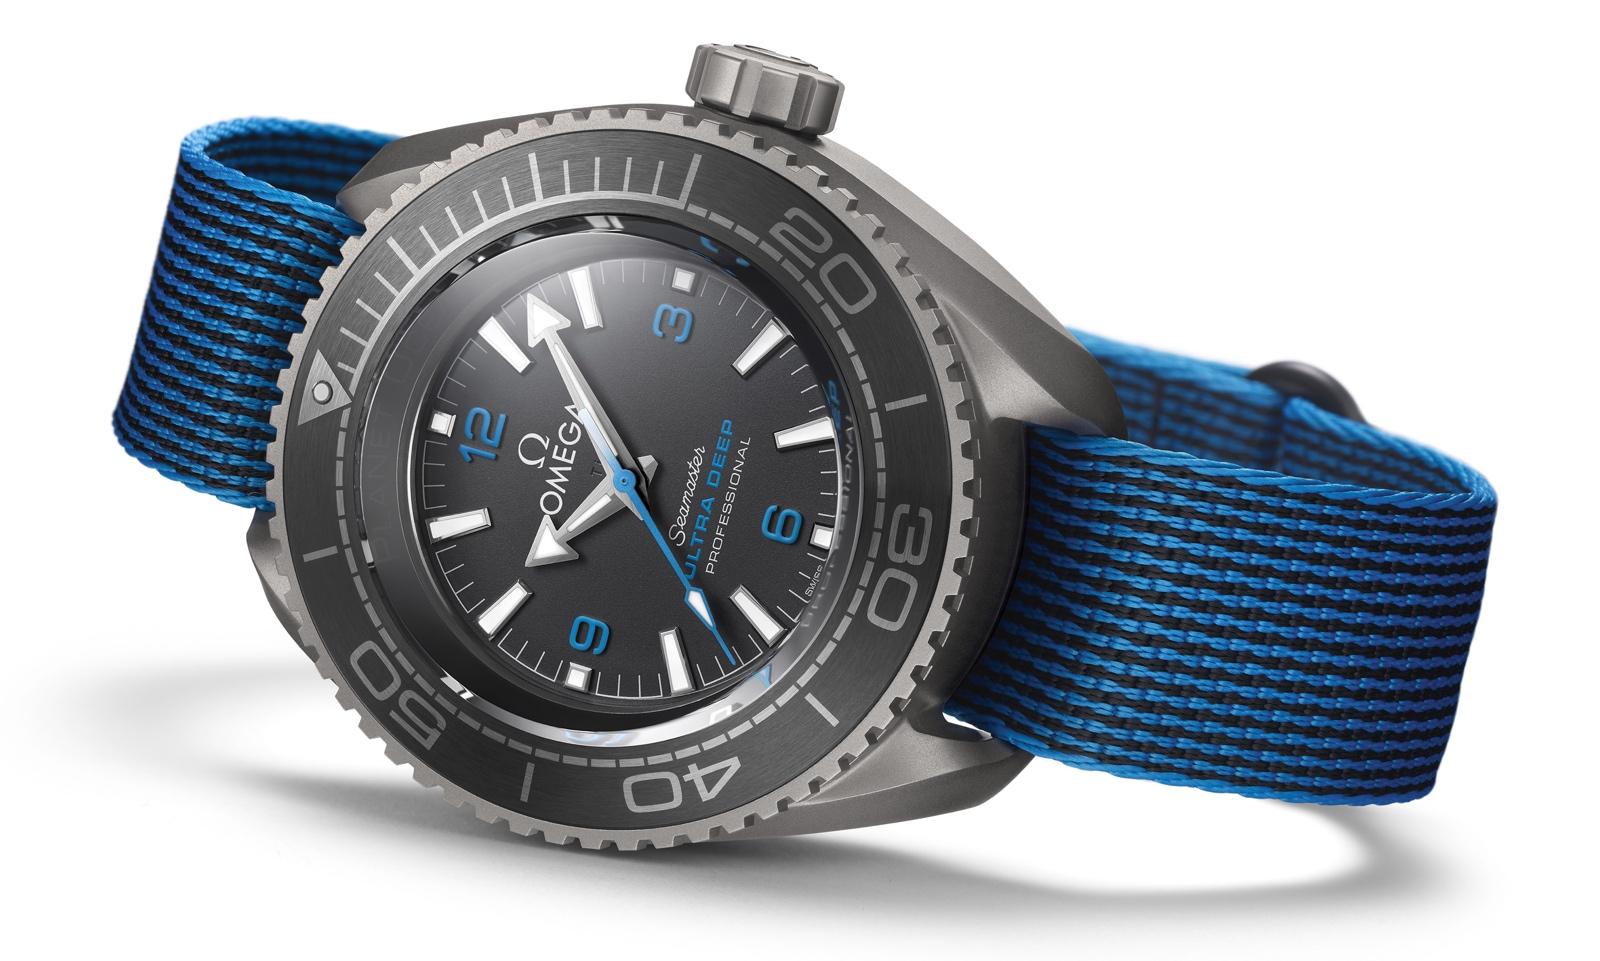 Omega-Seamaster-Planet-Ocean-Ultra-Deep-Professional-Mood